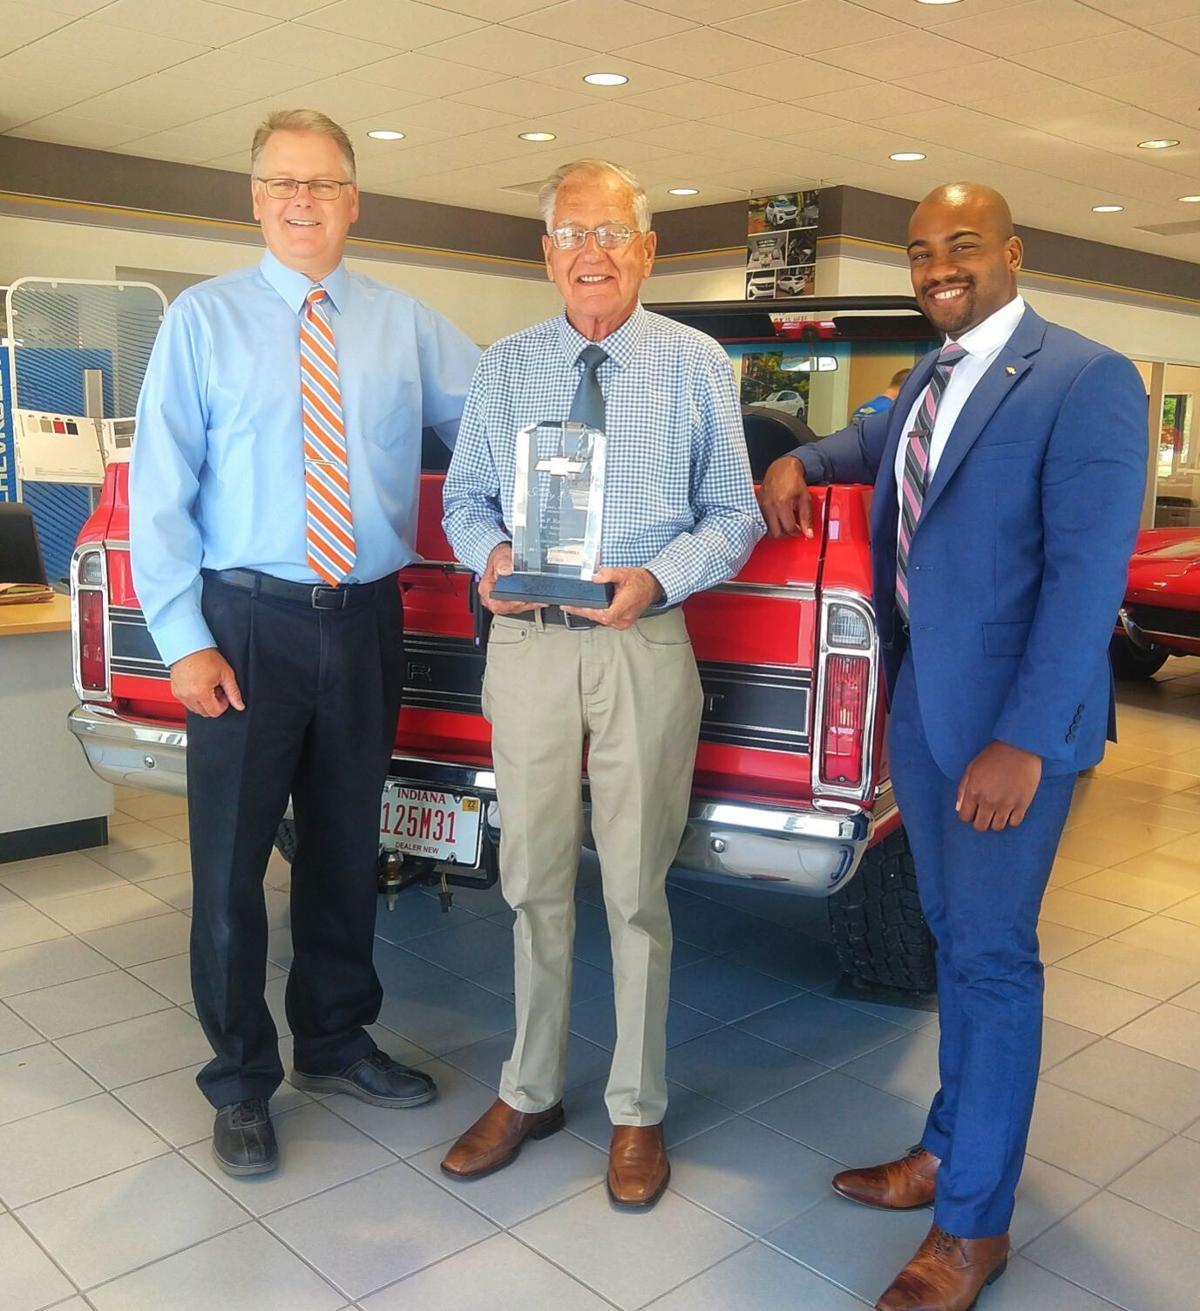 50 Years: Paul-Richard team credits customer focus with dealership longevity